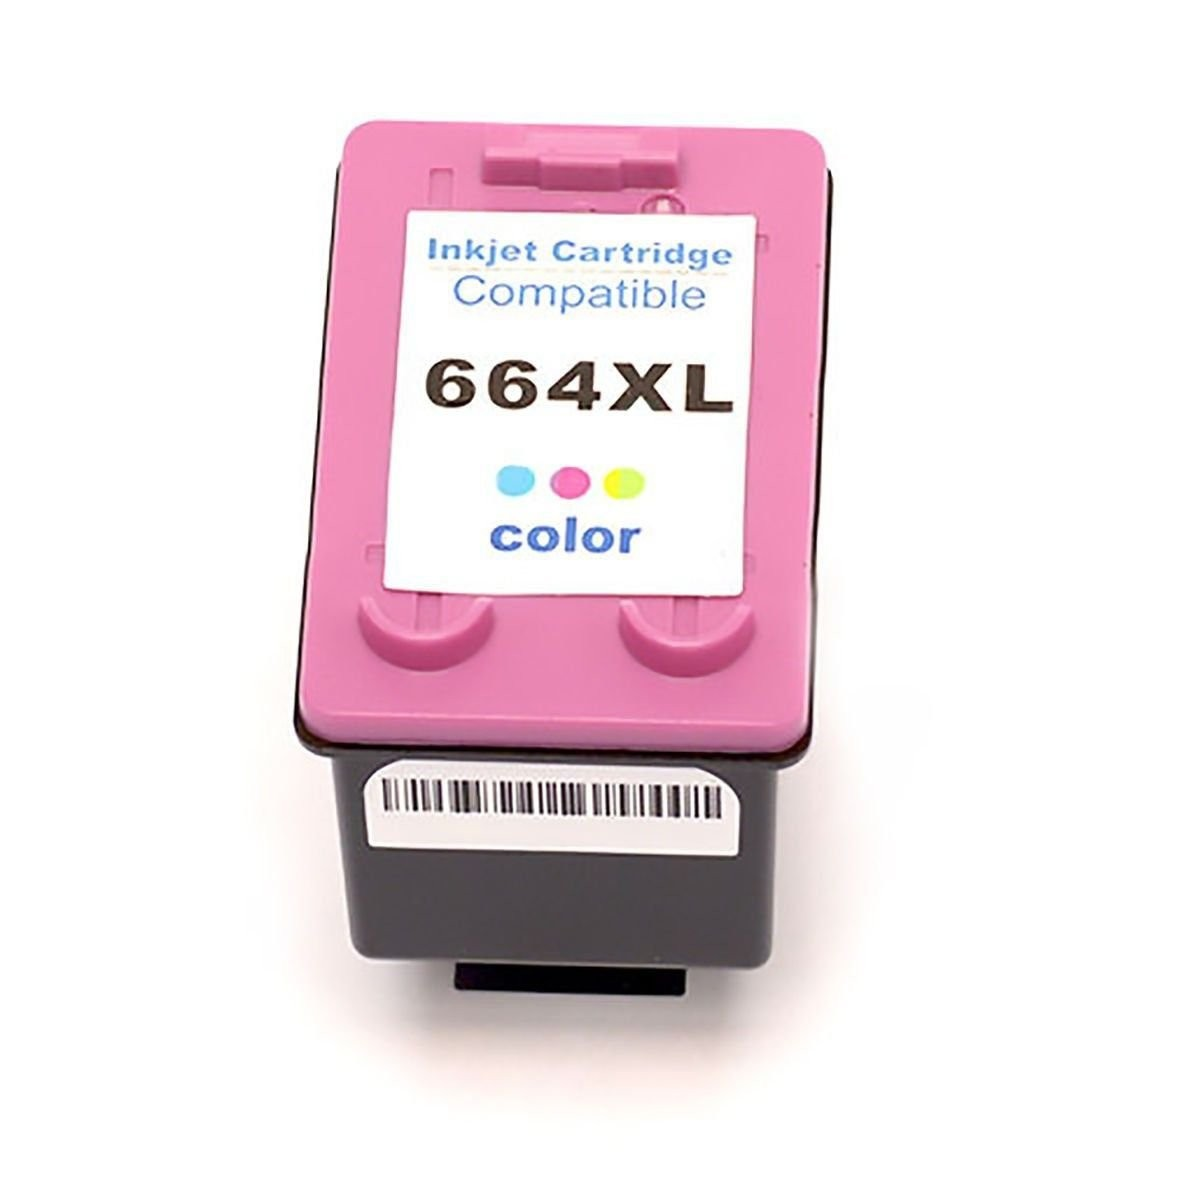 Foto 1 - HP 664XL |Cartucho Compatível| 18ml | Cor: Color | Série 3000